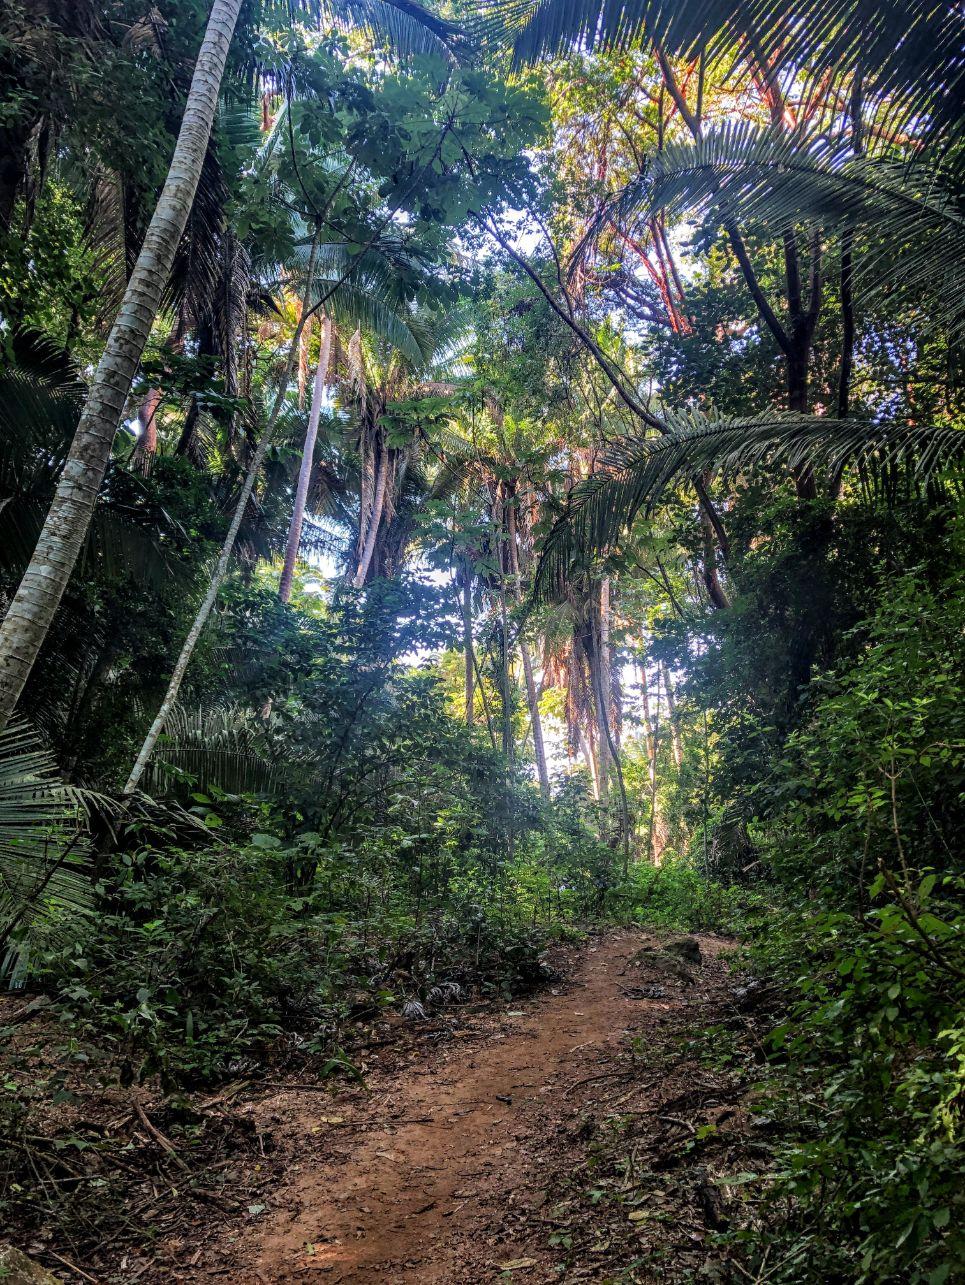 path winding through a lush green jungle on Monkey Mountain